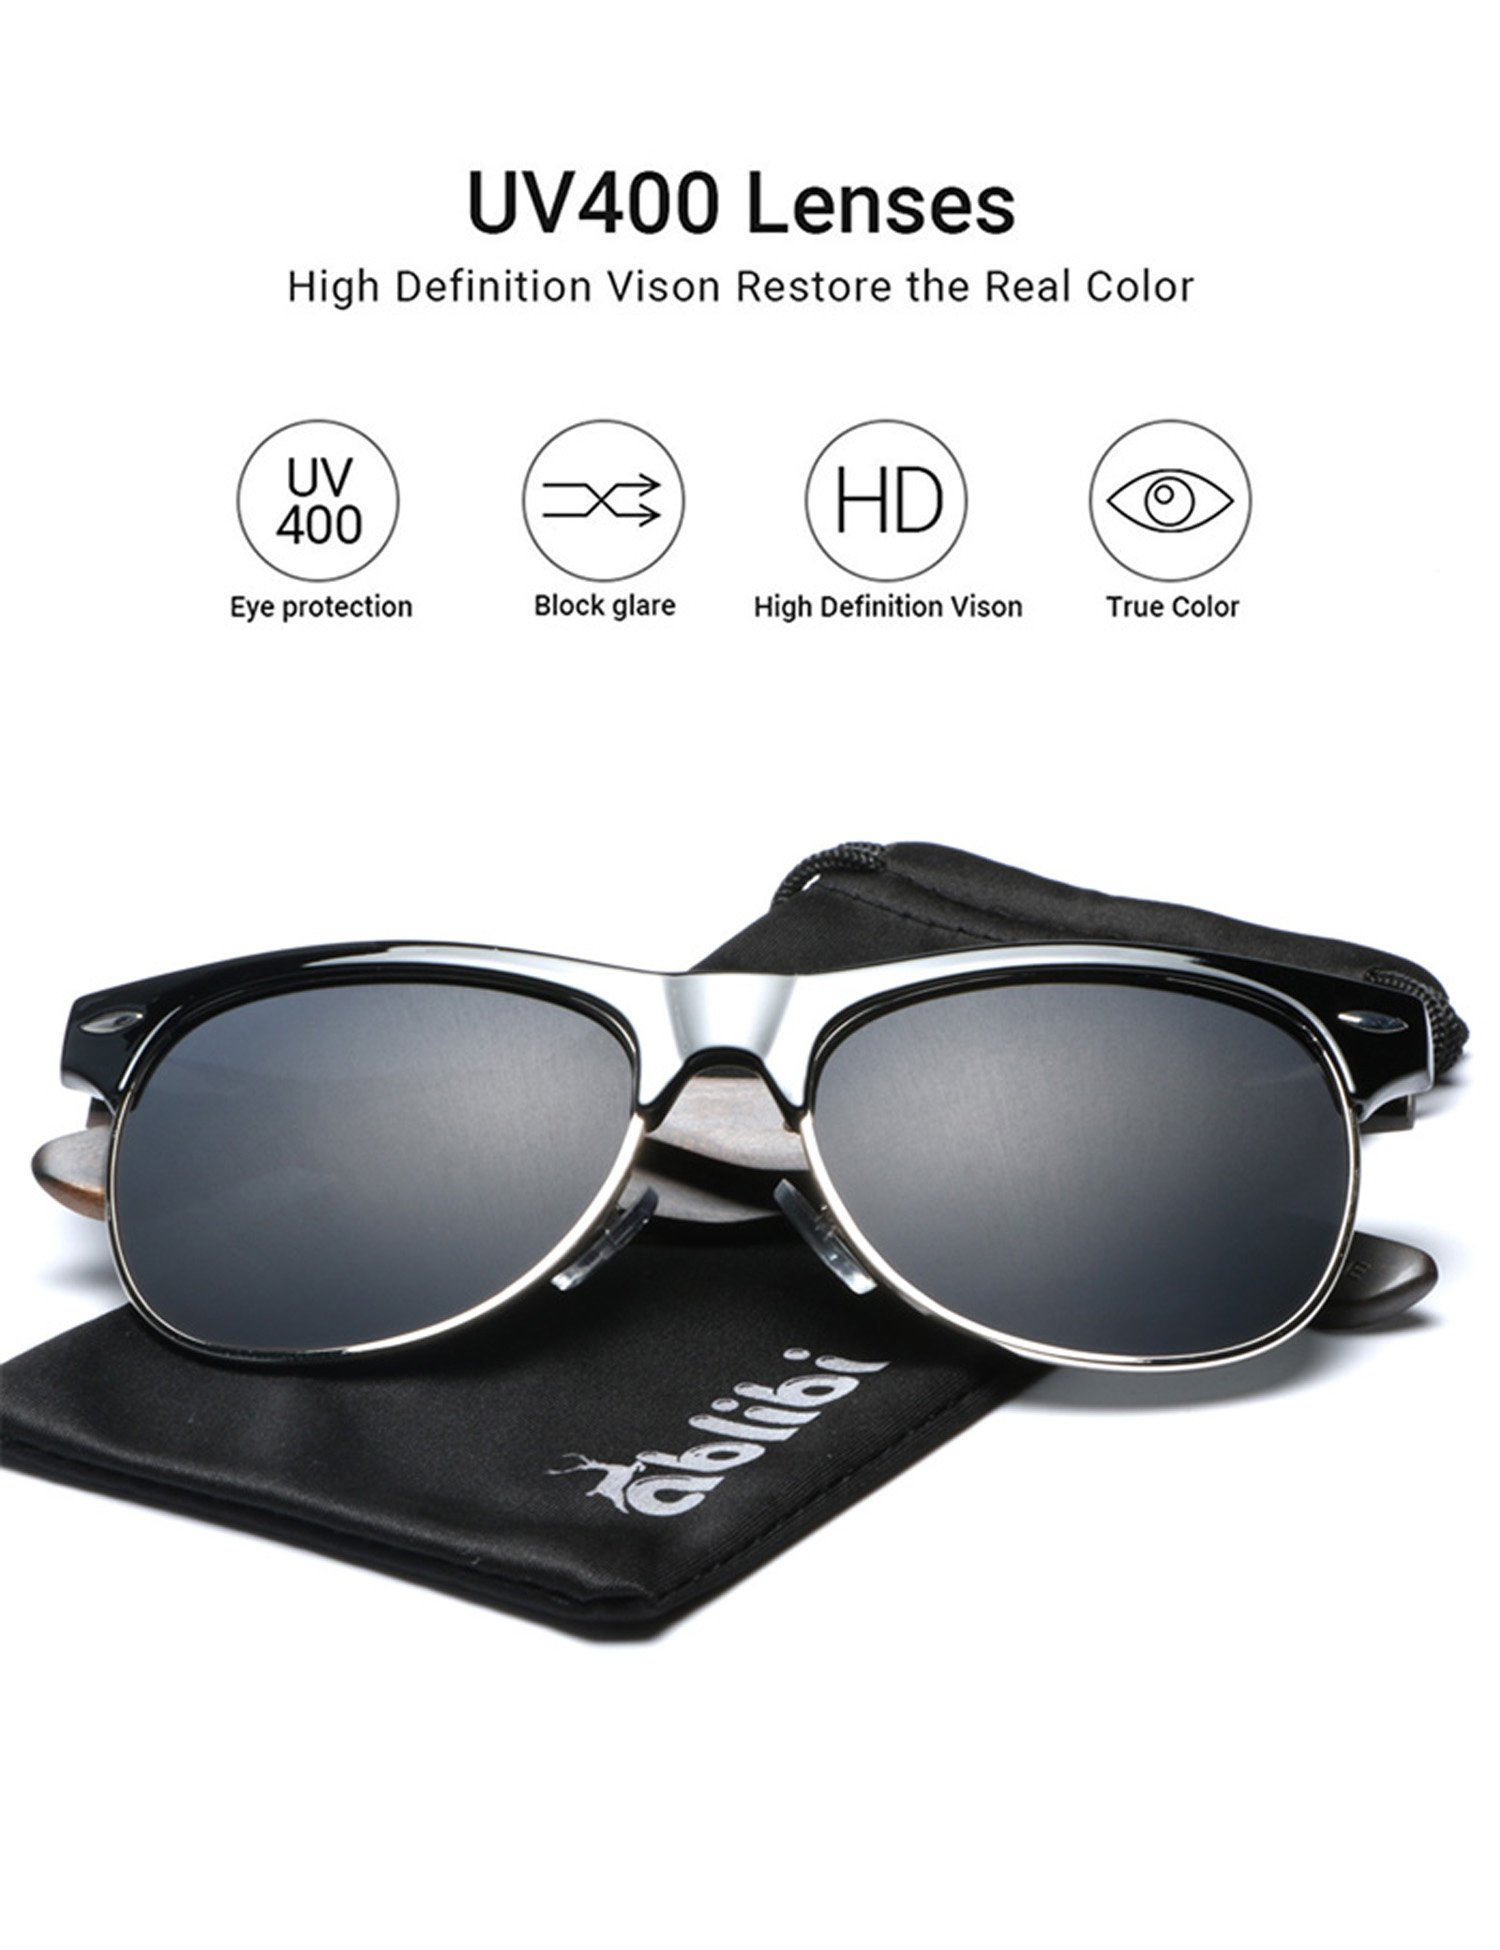 Ablibi Bamboo Wood Semi Rimless Sunglasses with Polarized Lenses in Original Boxes (Ebony, Grey)